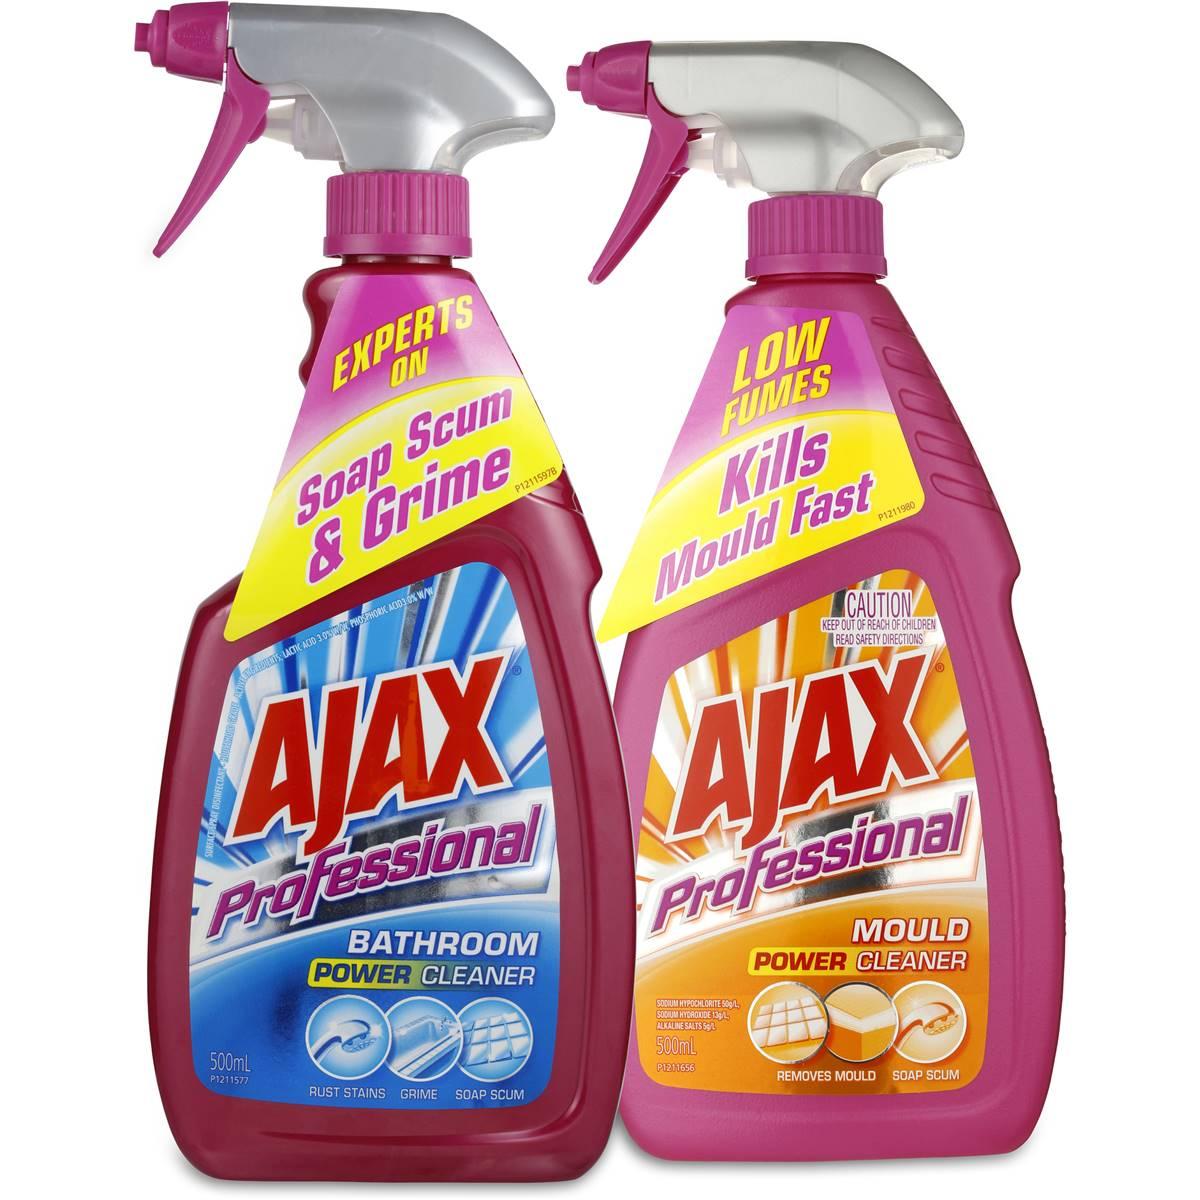 Ajax Professionals Bathroom Cleaner Bundle Image